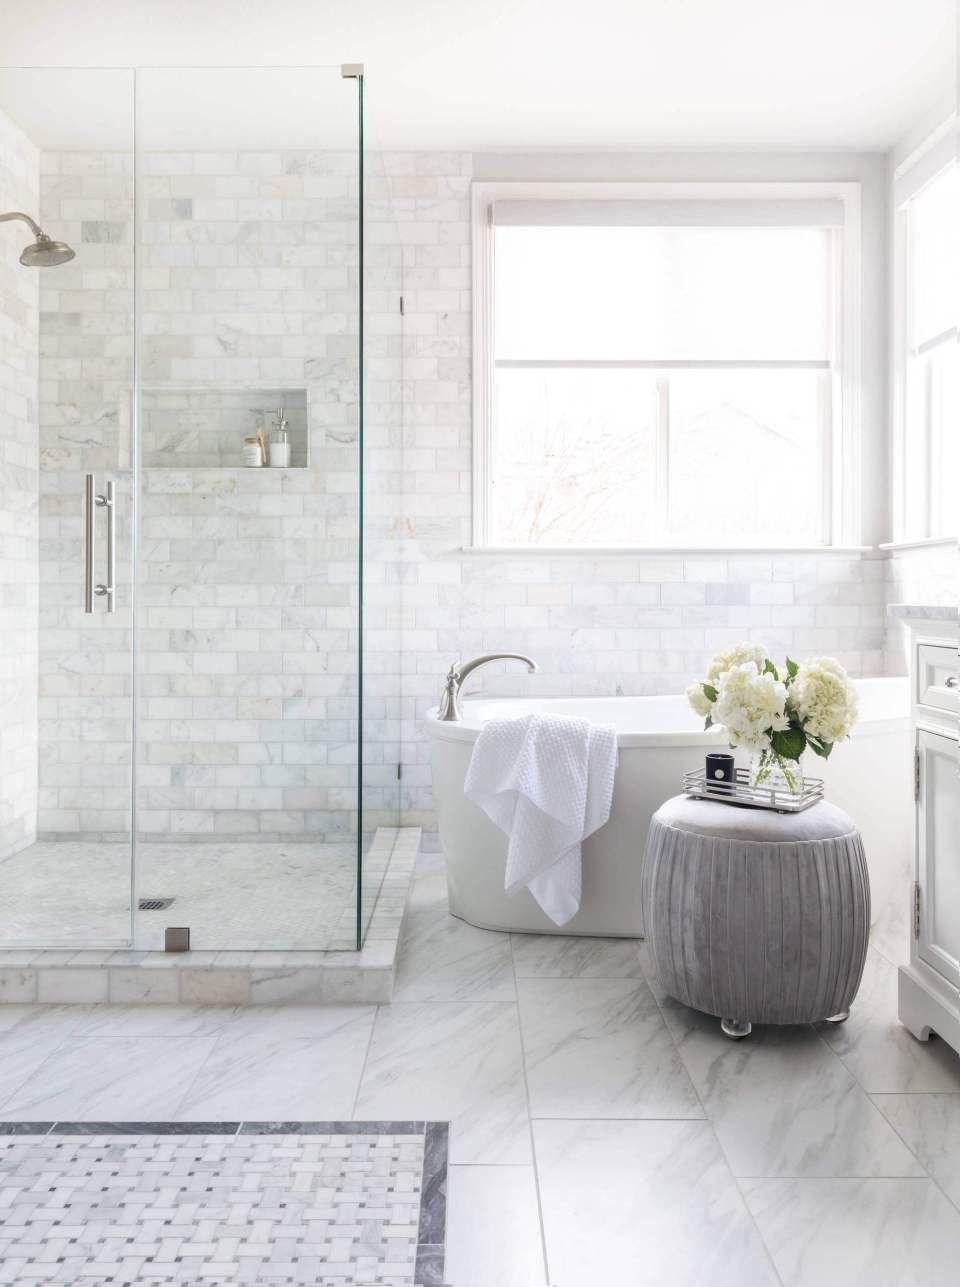 20 Best Transitional Bathroom Ideas Designs For 2021 Master Bath Tile Master Bathroom Bathroom Remodel Master Bathroom design ideas 2021